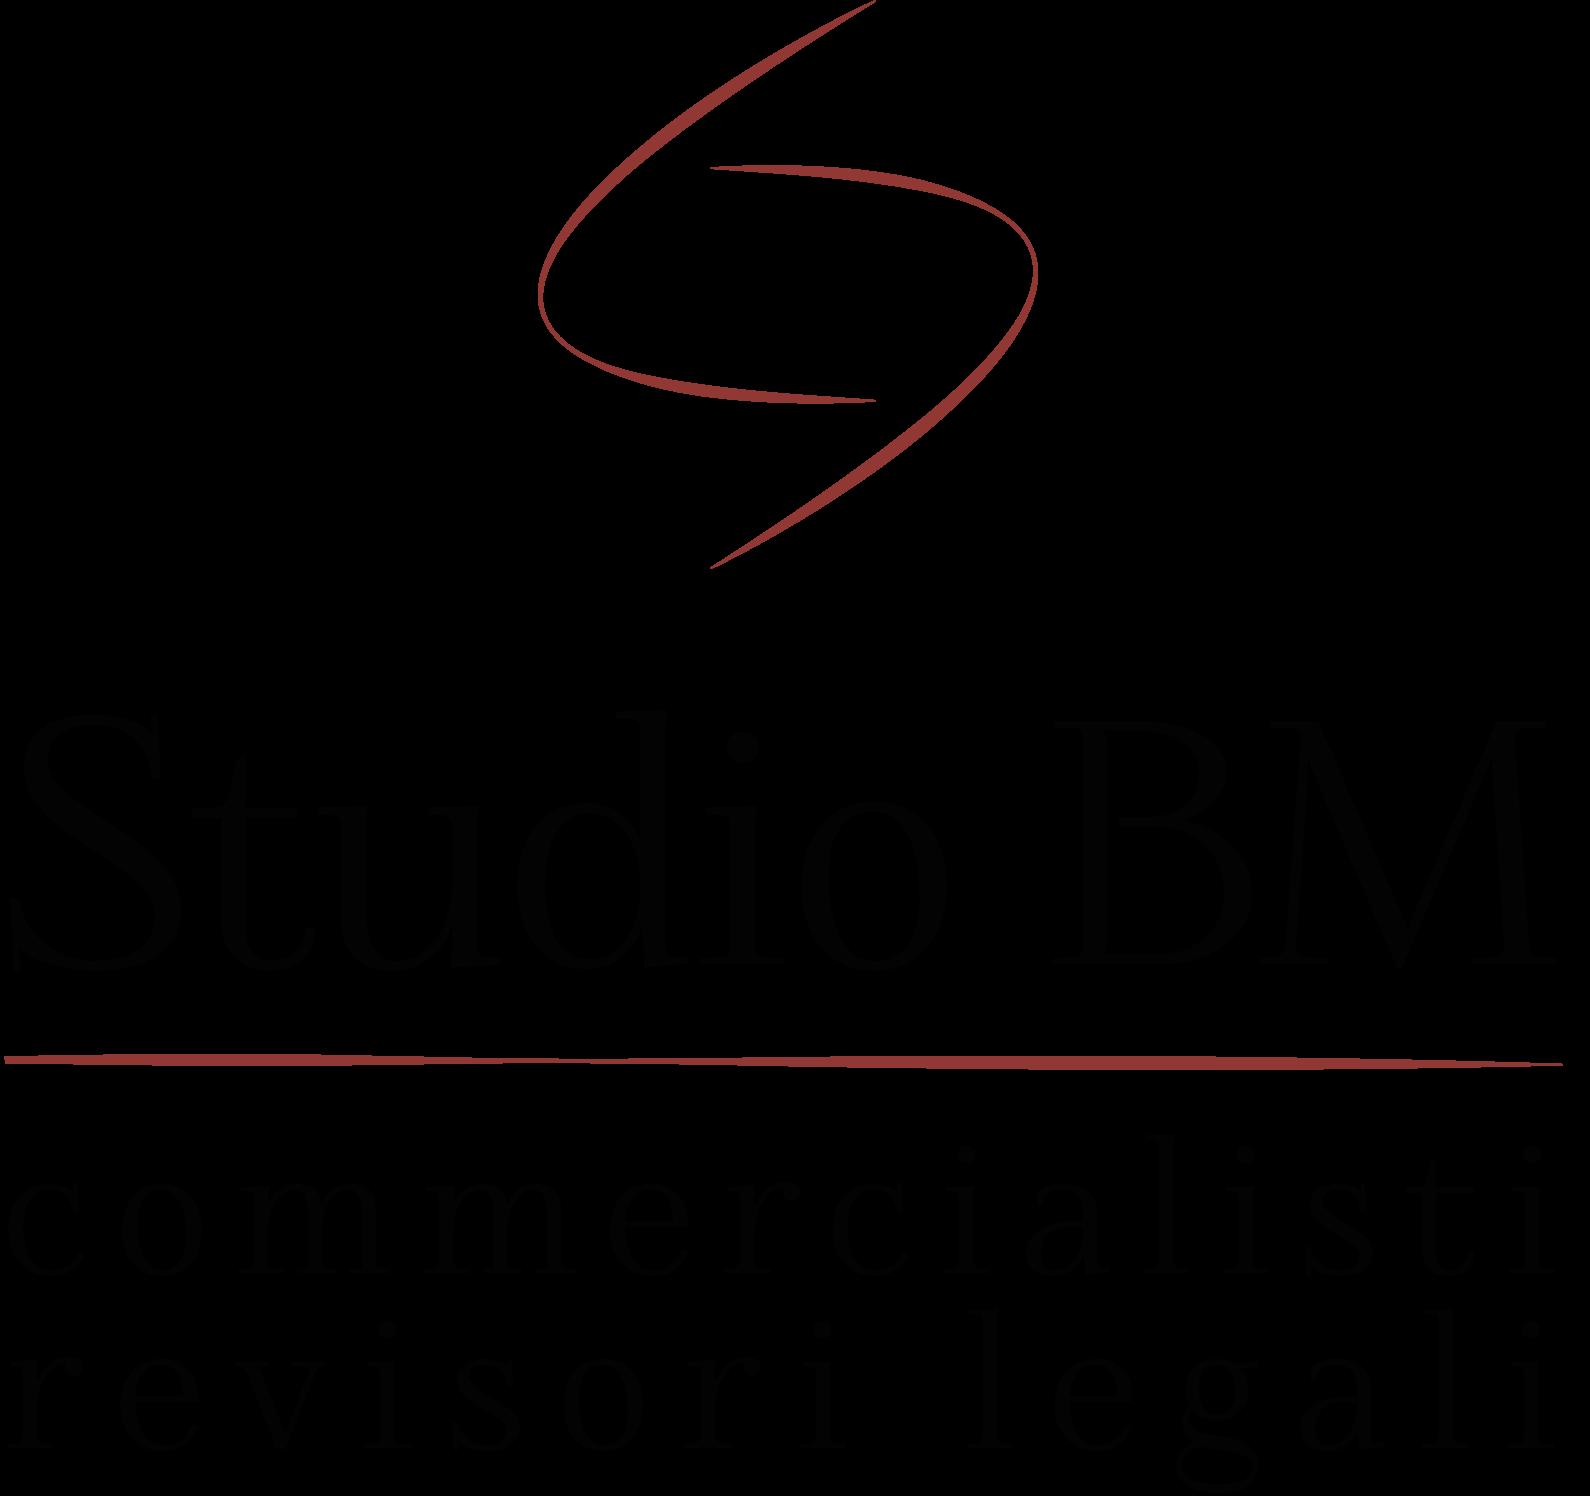 Logo Definitivo Logo Alto Versione 2 Bordeaux Vers 2 Nero